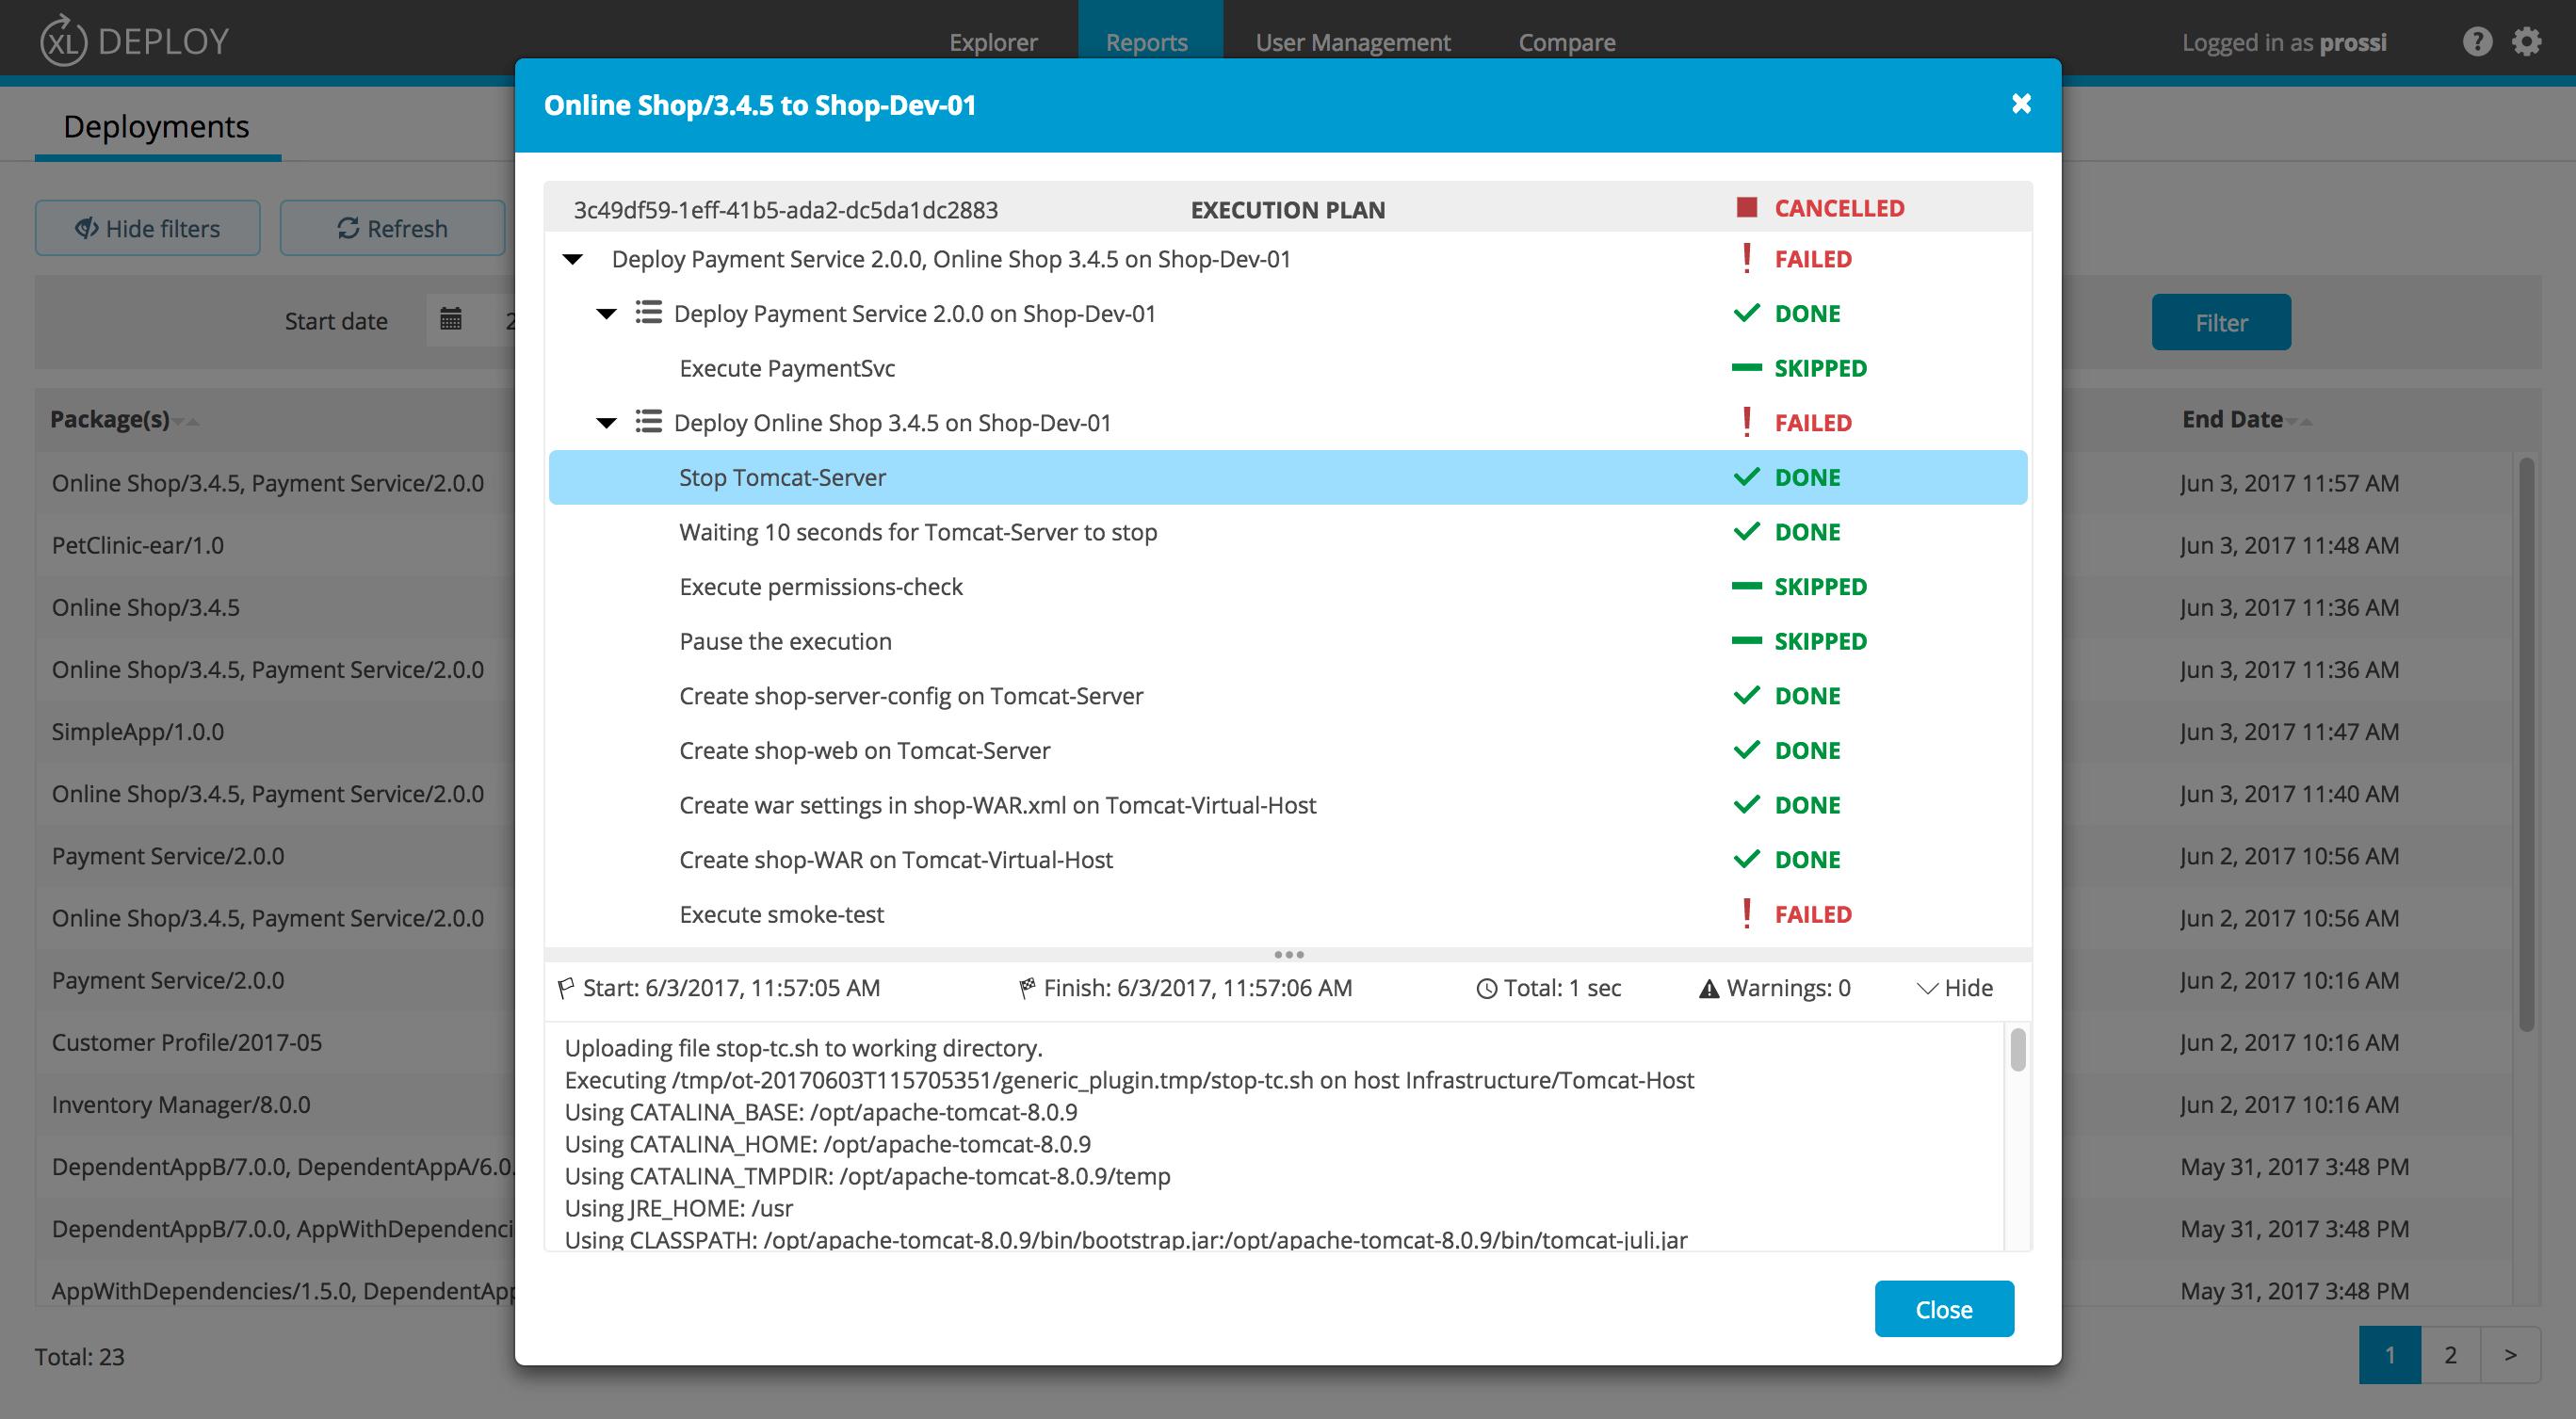 XL Deploy v7.0 Deployment Reports